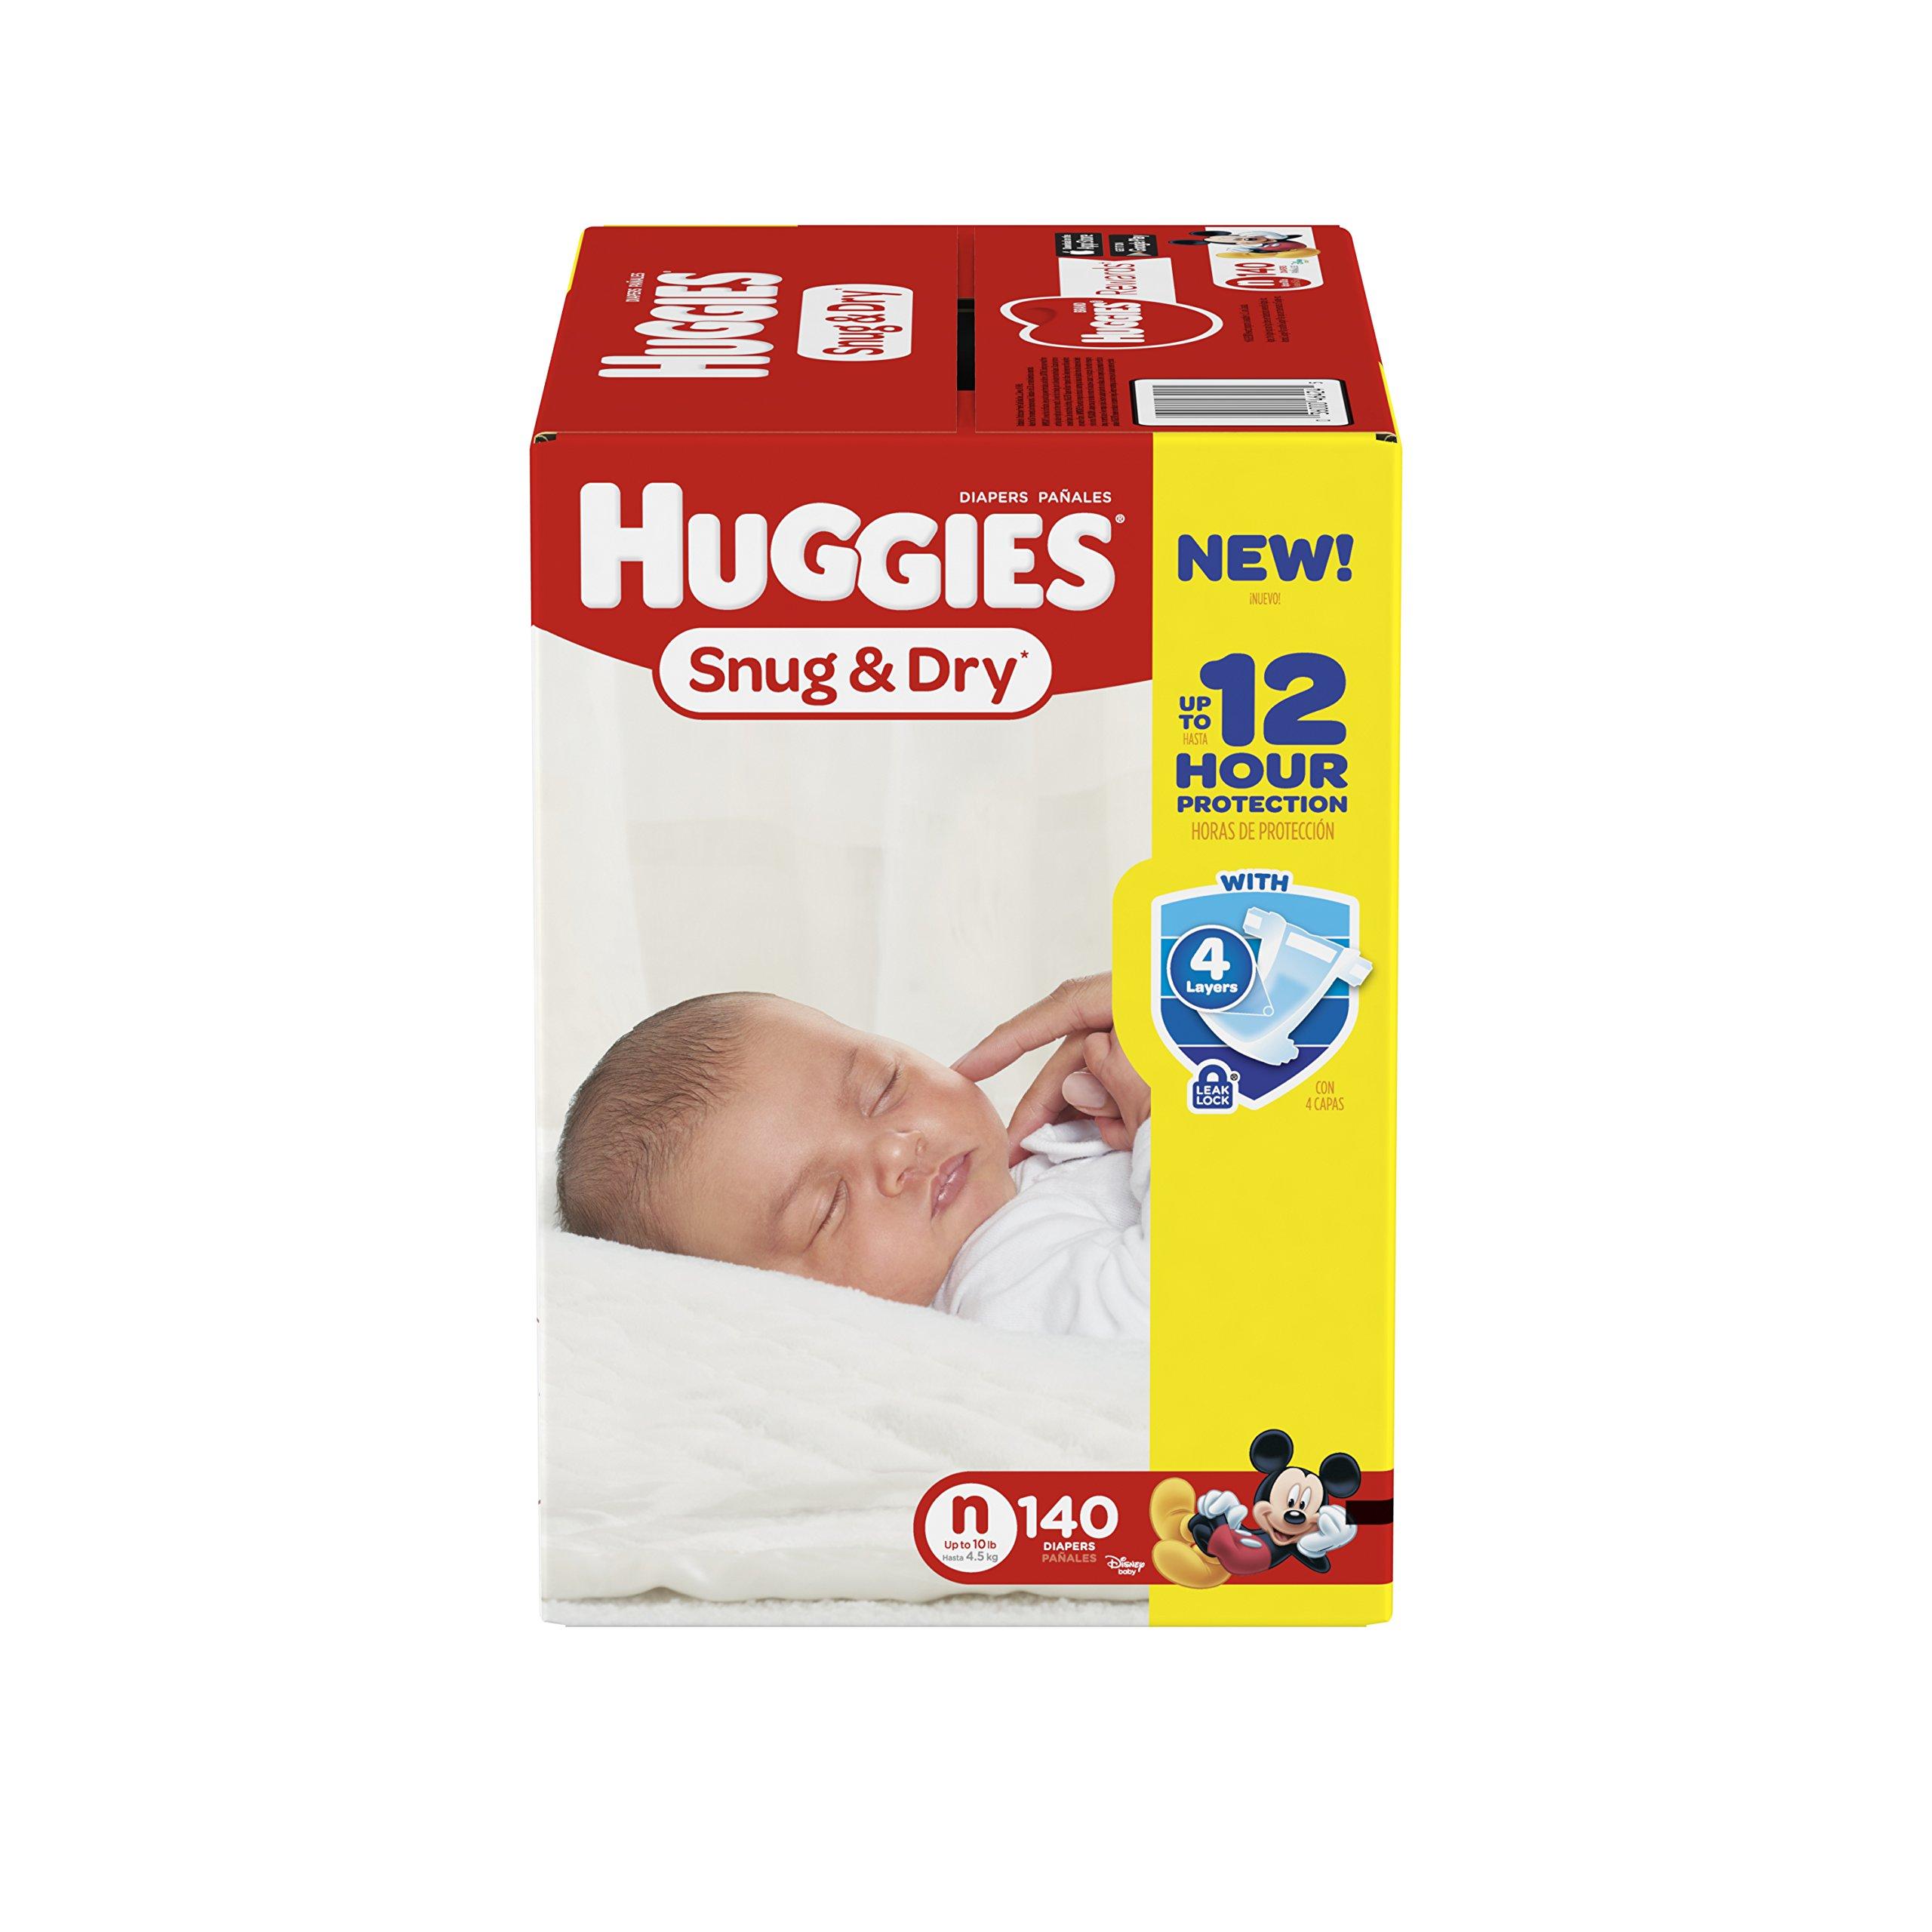 Huggies Snug and Dry Diapers Newborn 140 Count Free ...